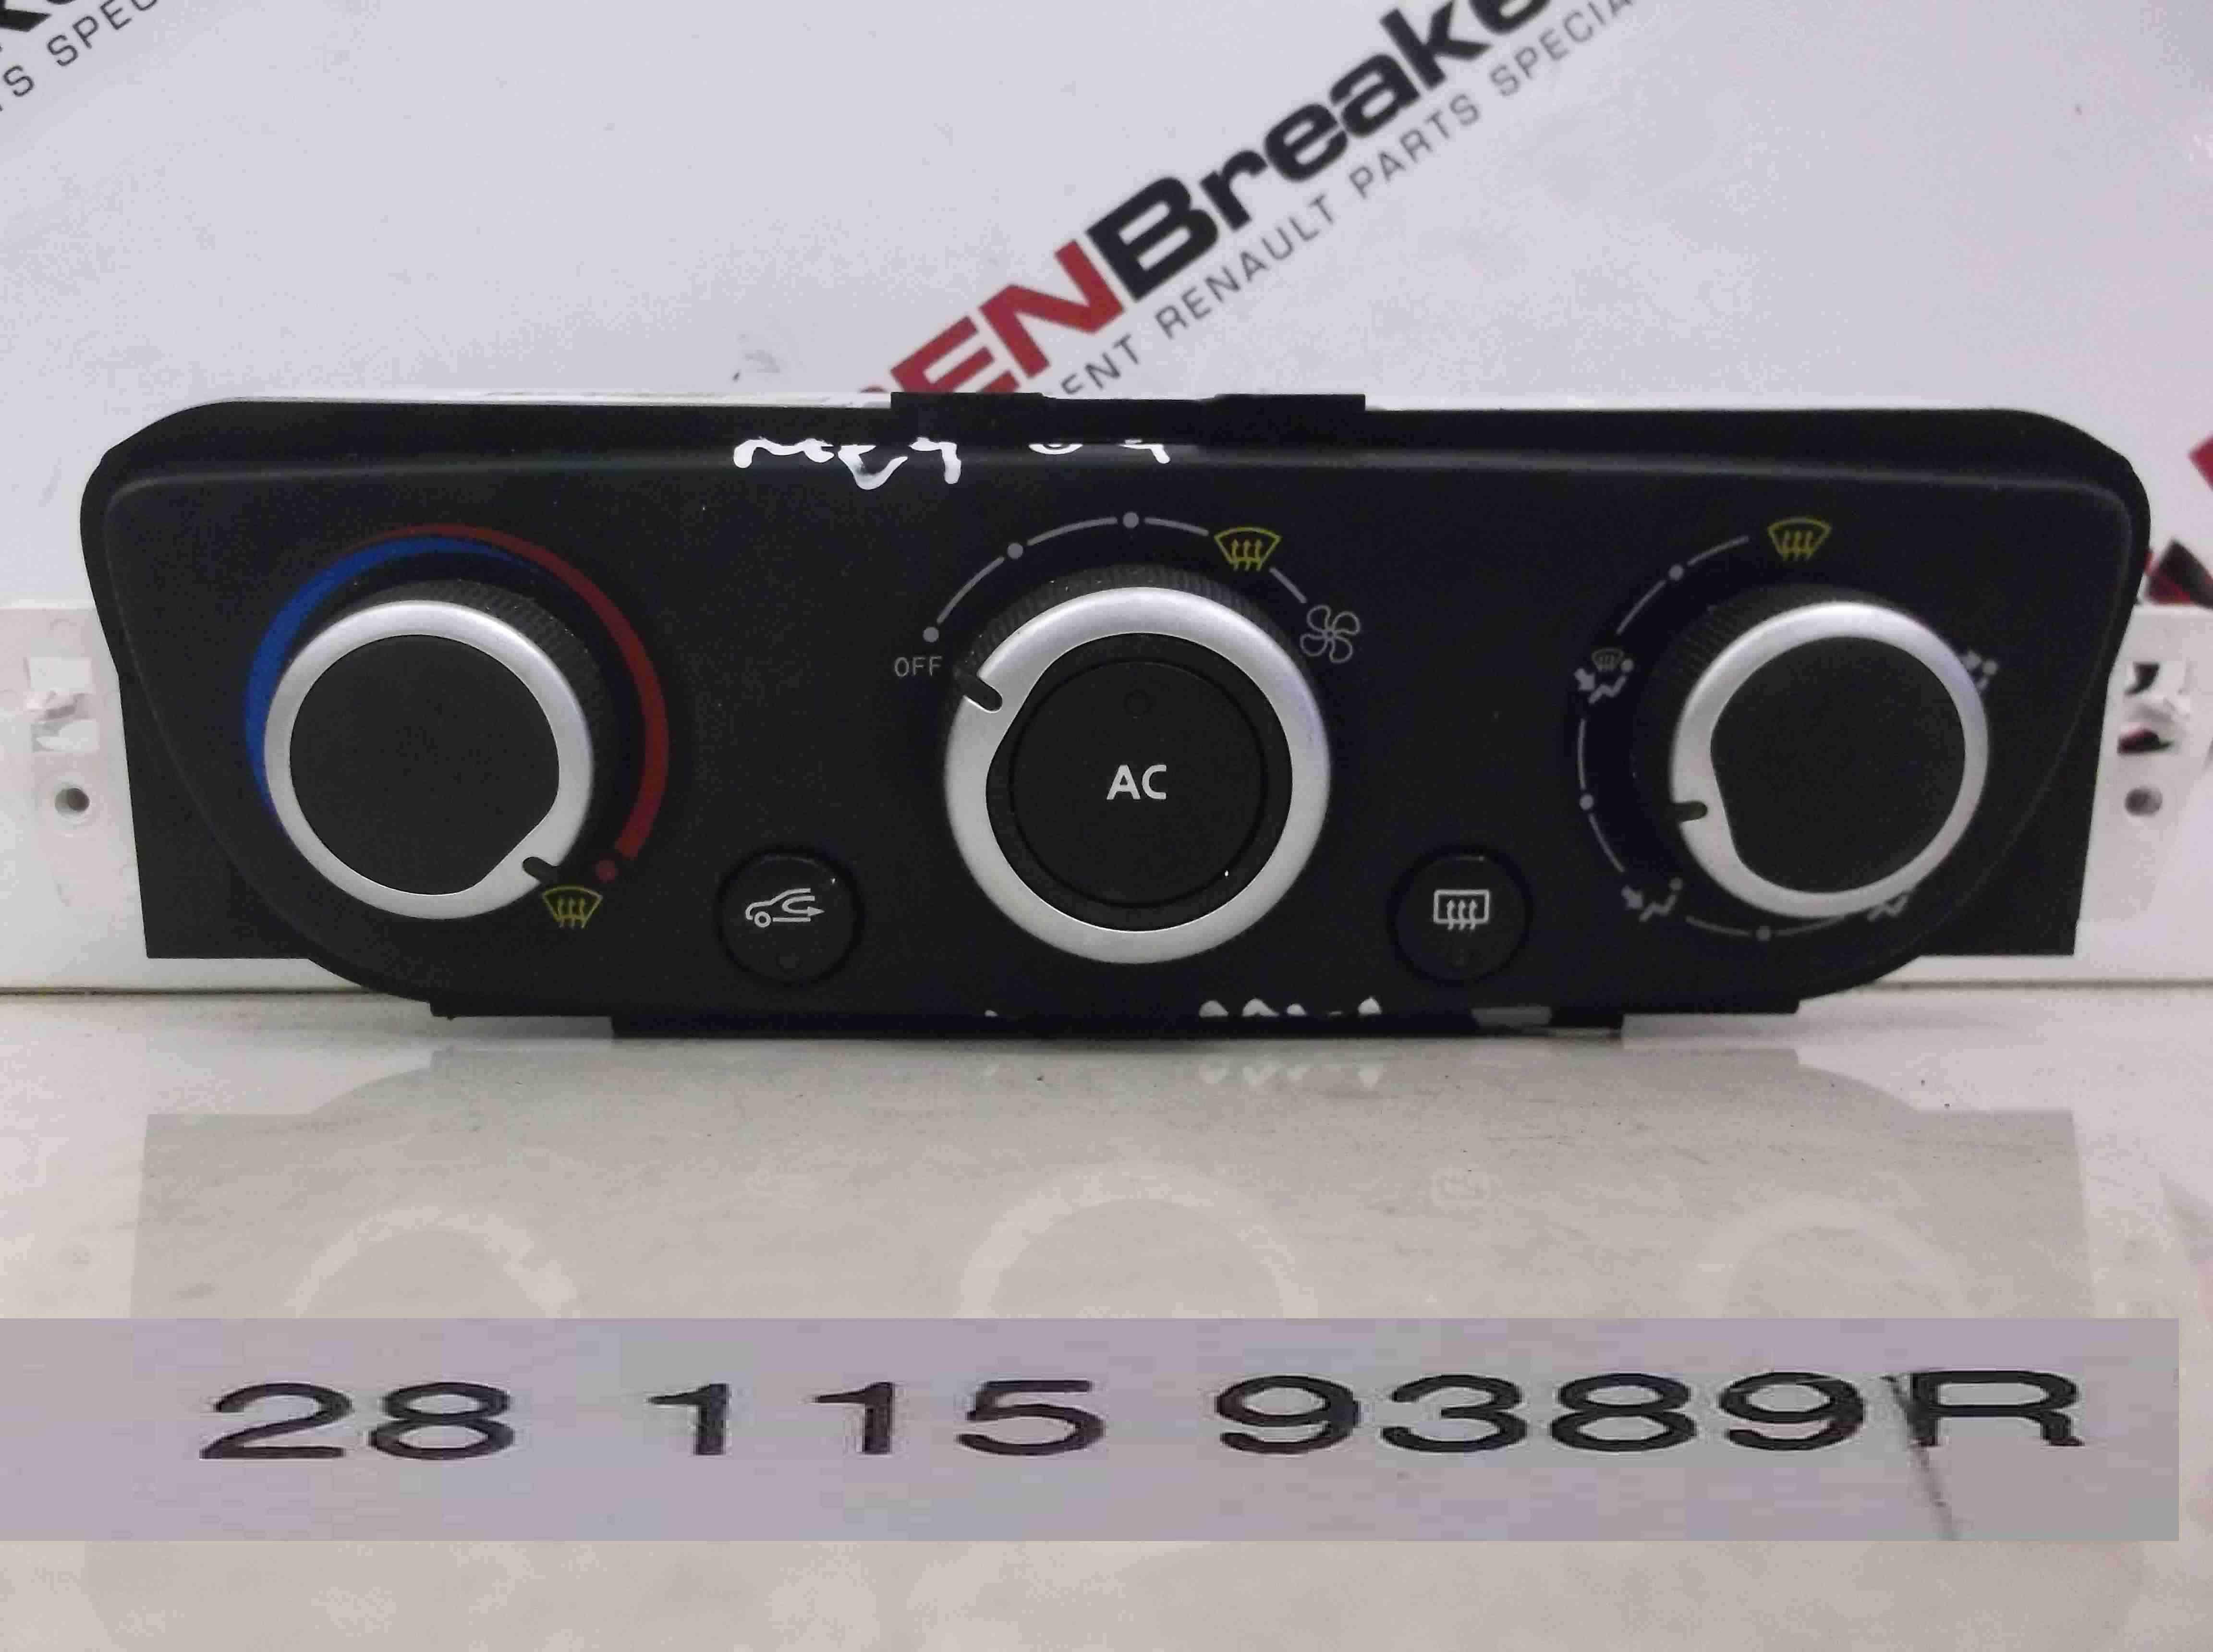 Renault Megane MK3 20082014 Heater Controls Dials Air Con T1001786G